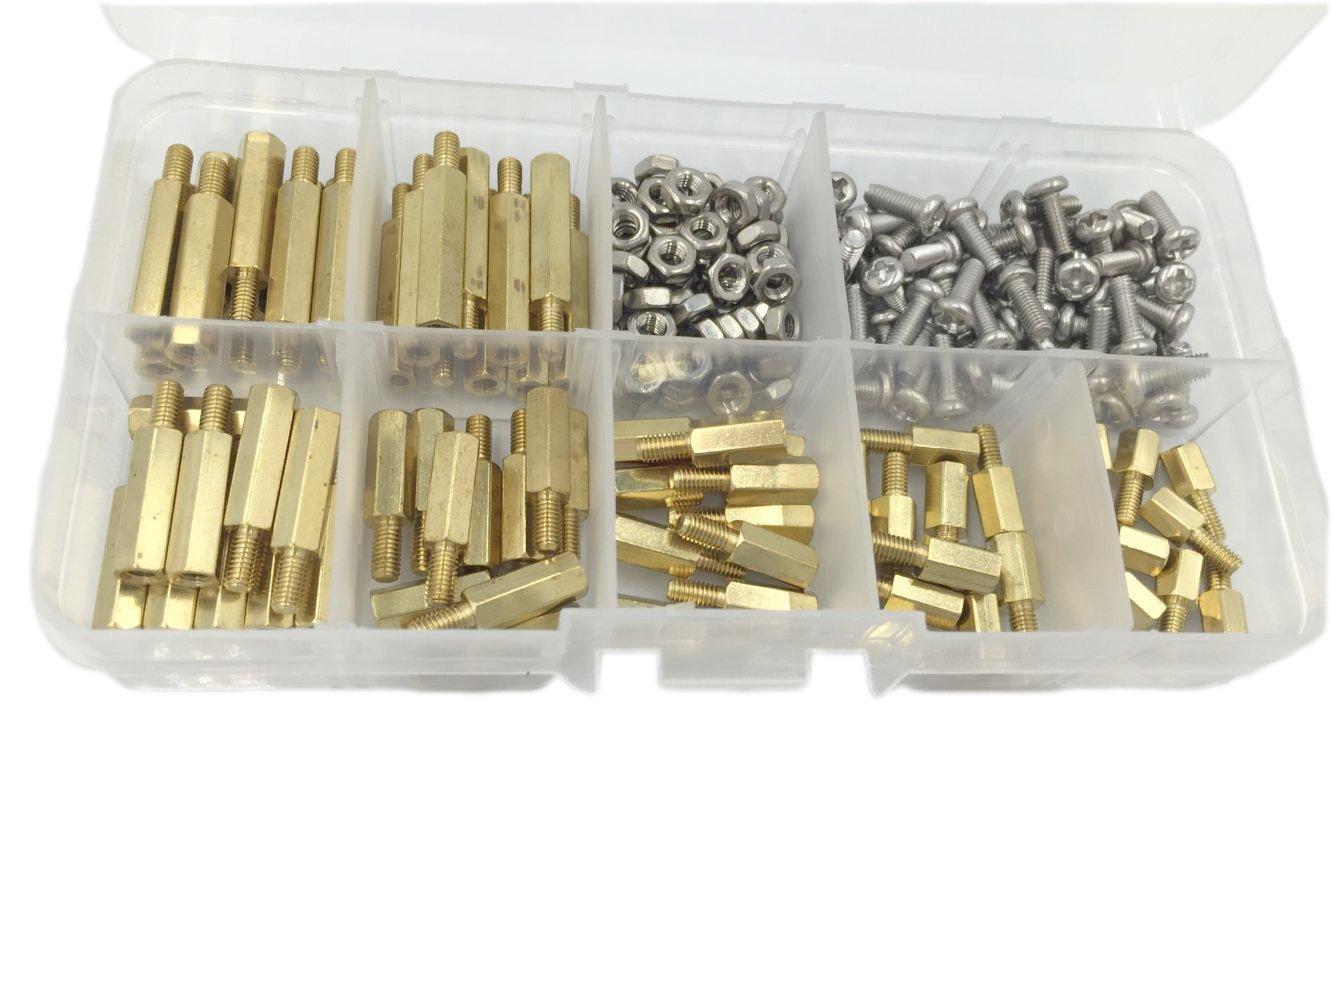 HVAZI 210pcs M3 Male Female Brass Spacer Standoff//Stainless Steel Screw//Nut Assortment Kit honghuida